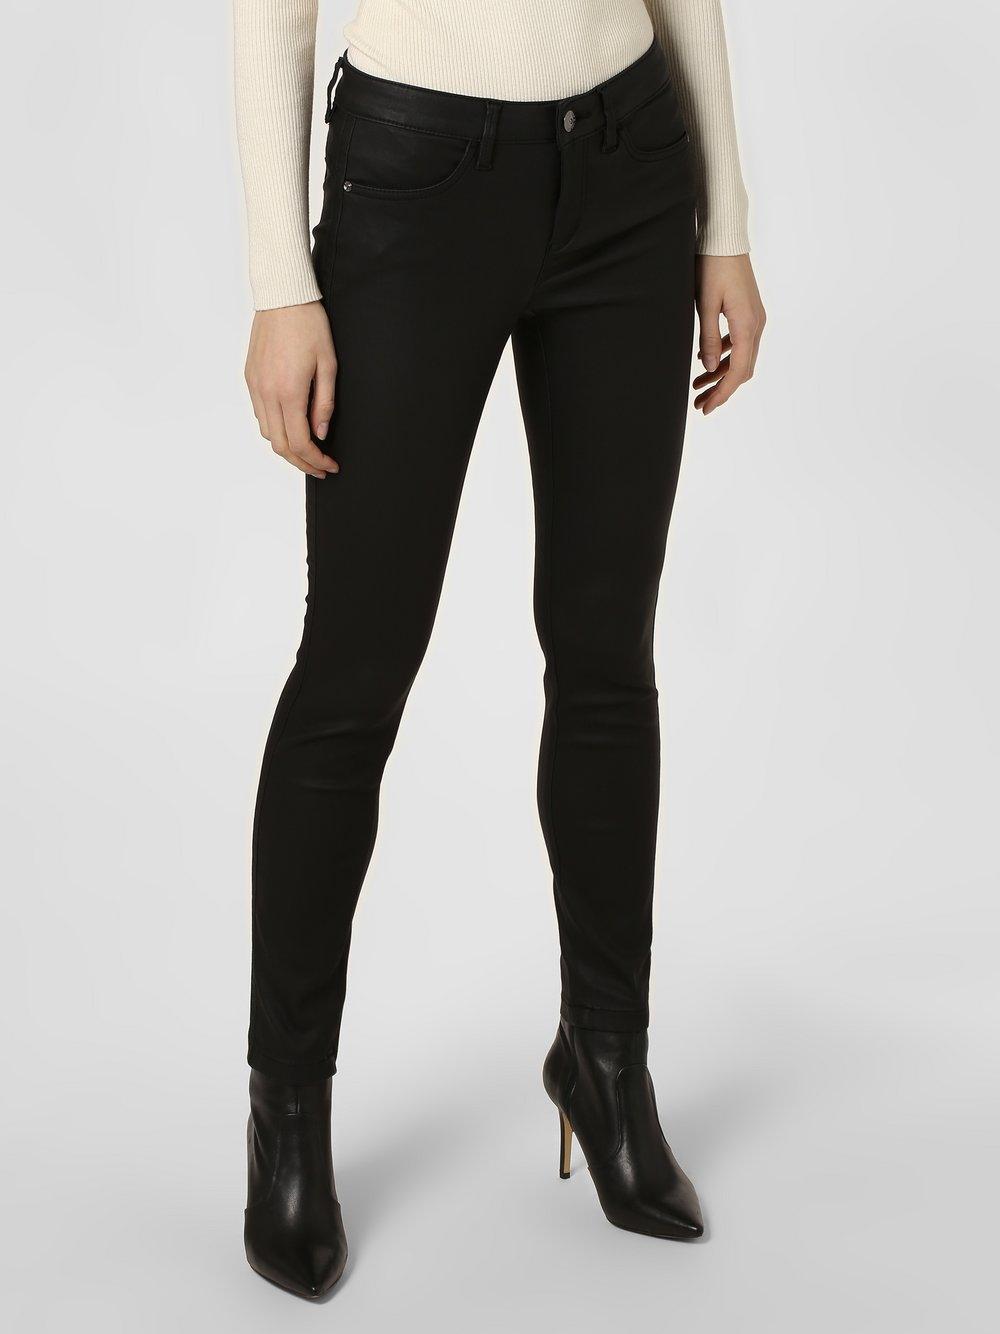 Street One – Spodnie damskie – York, czarny Van Graaf 459383-0001